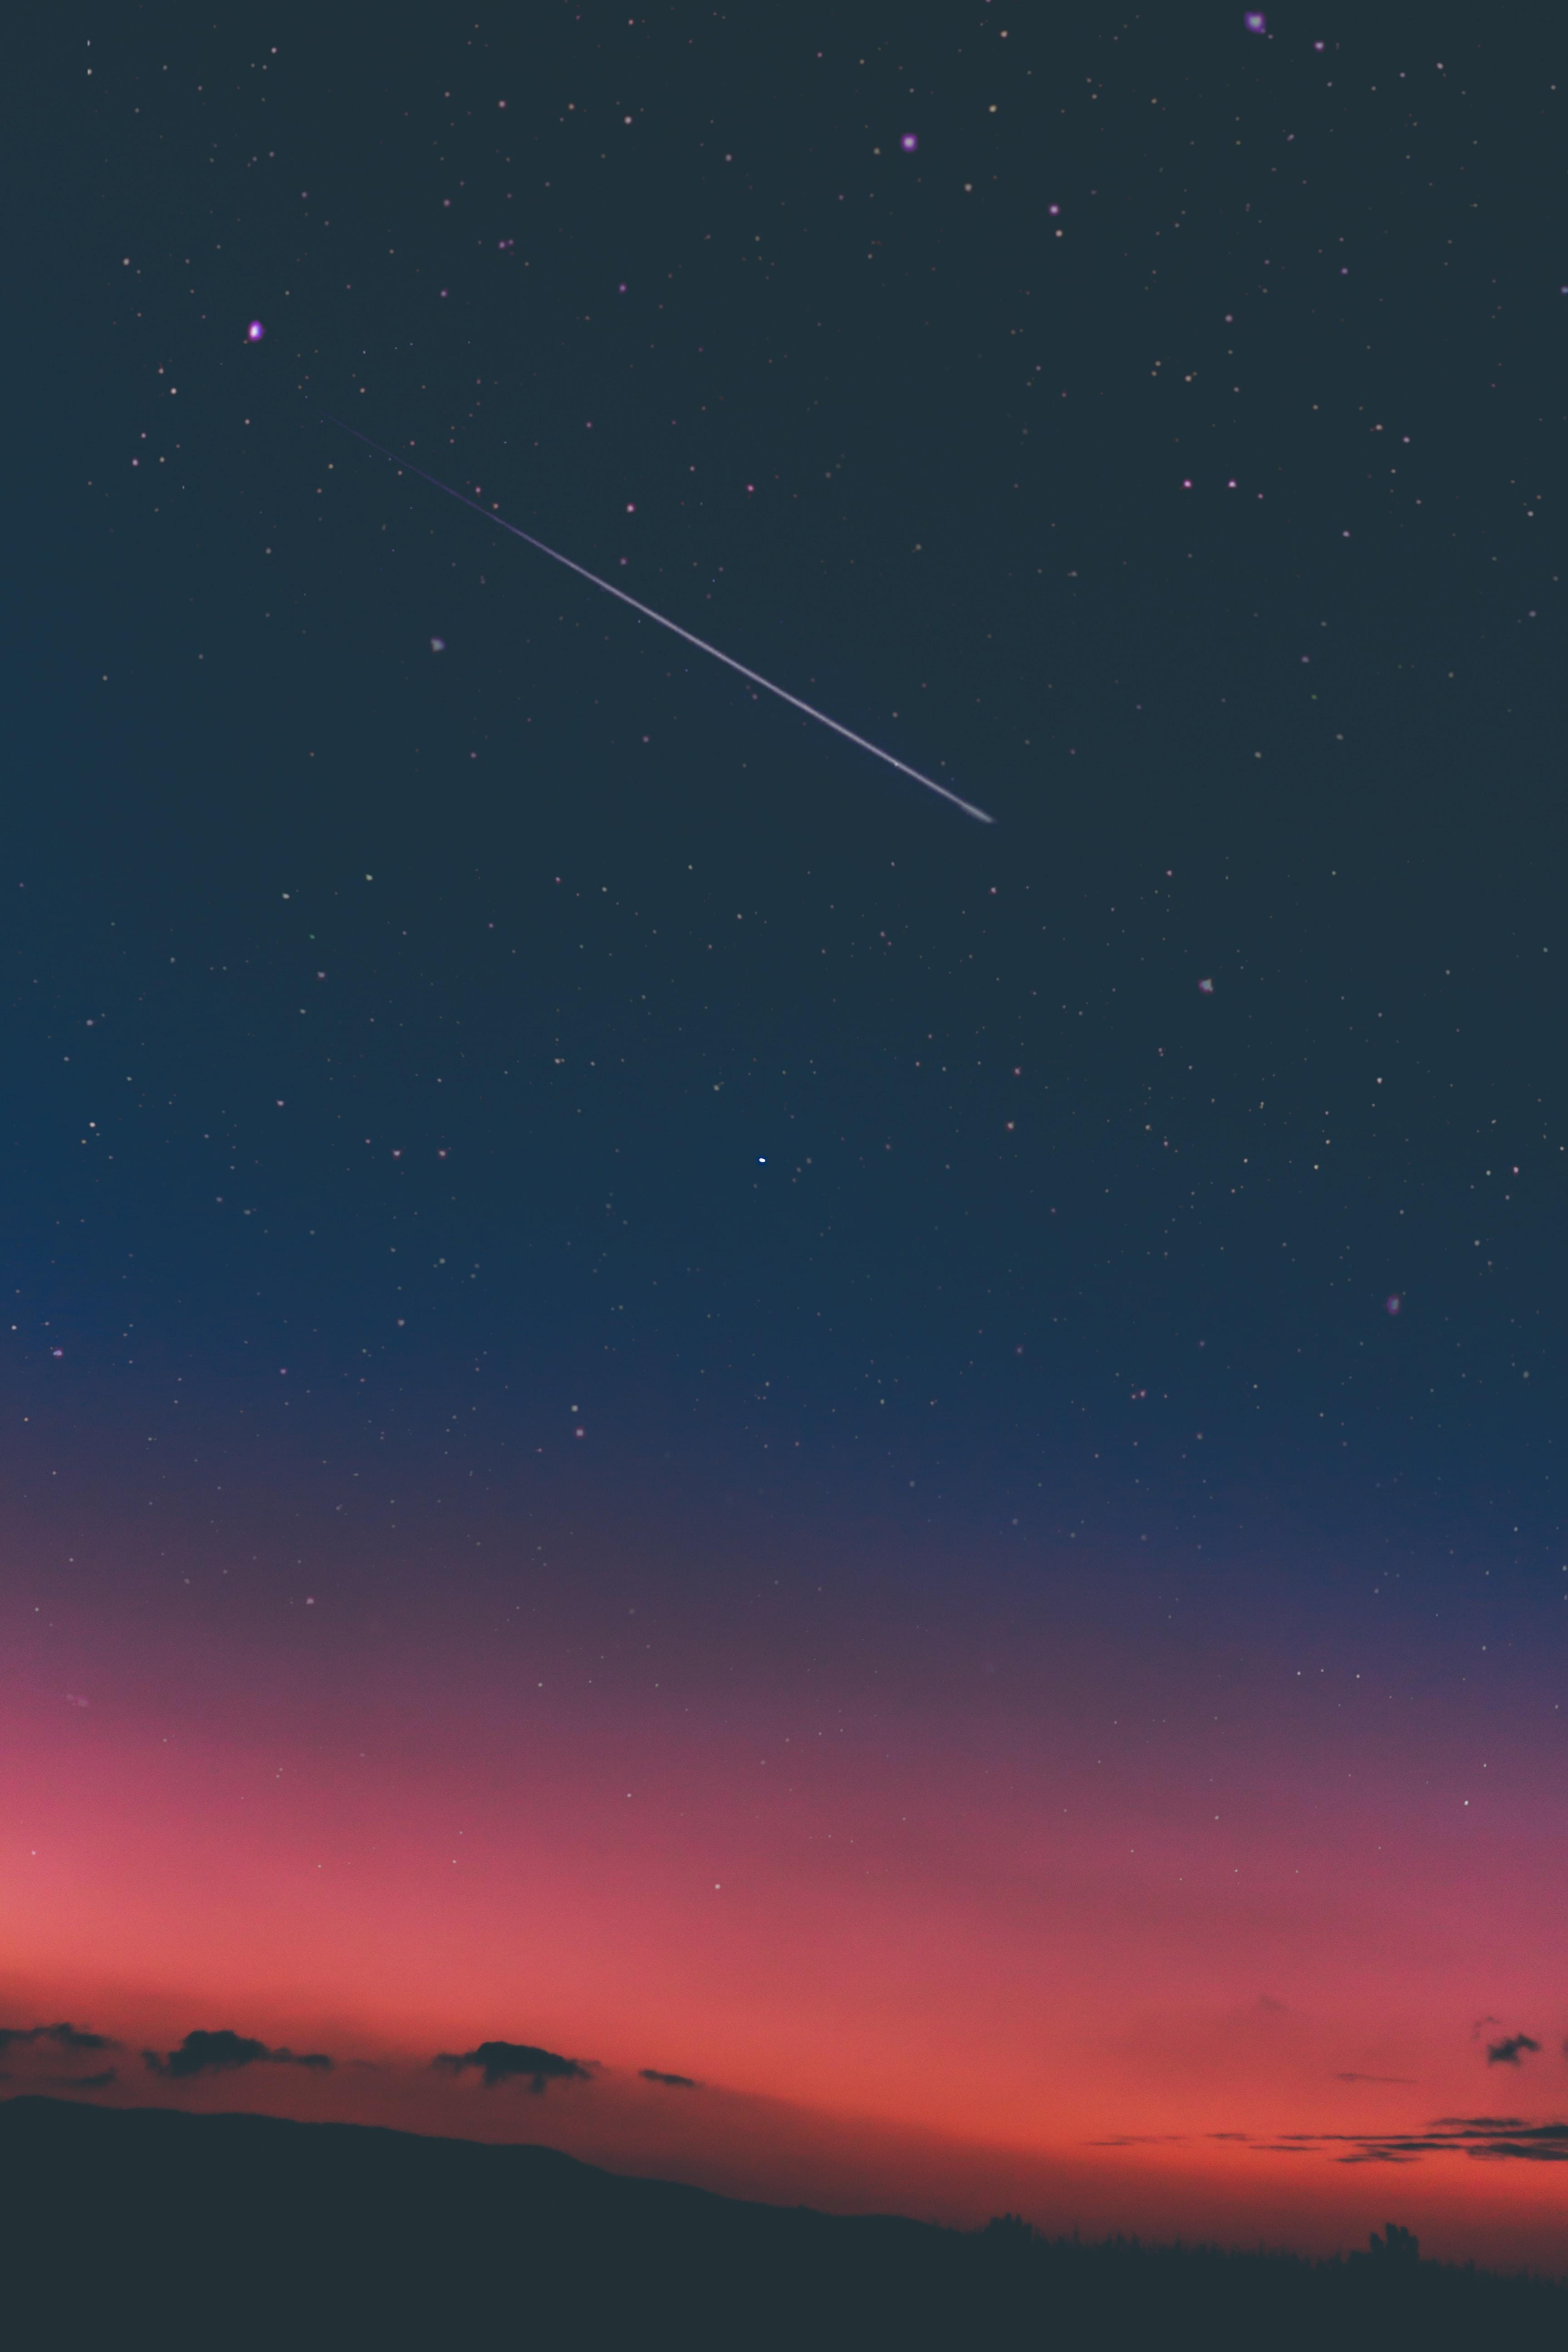 shooting star photo by diego ph   jdiegoph  on unsplash